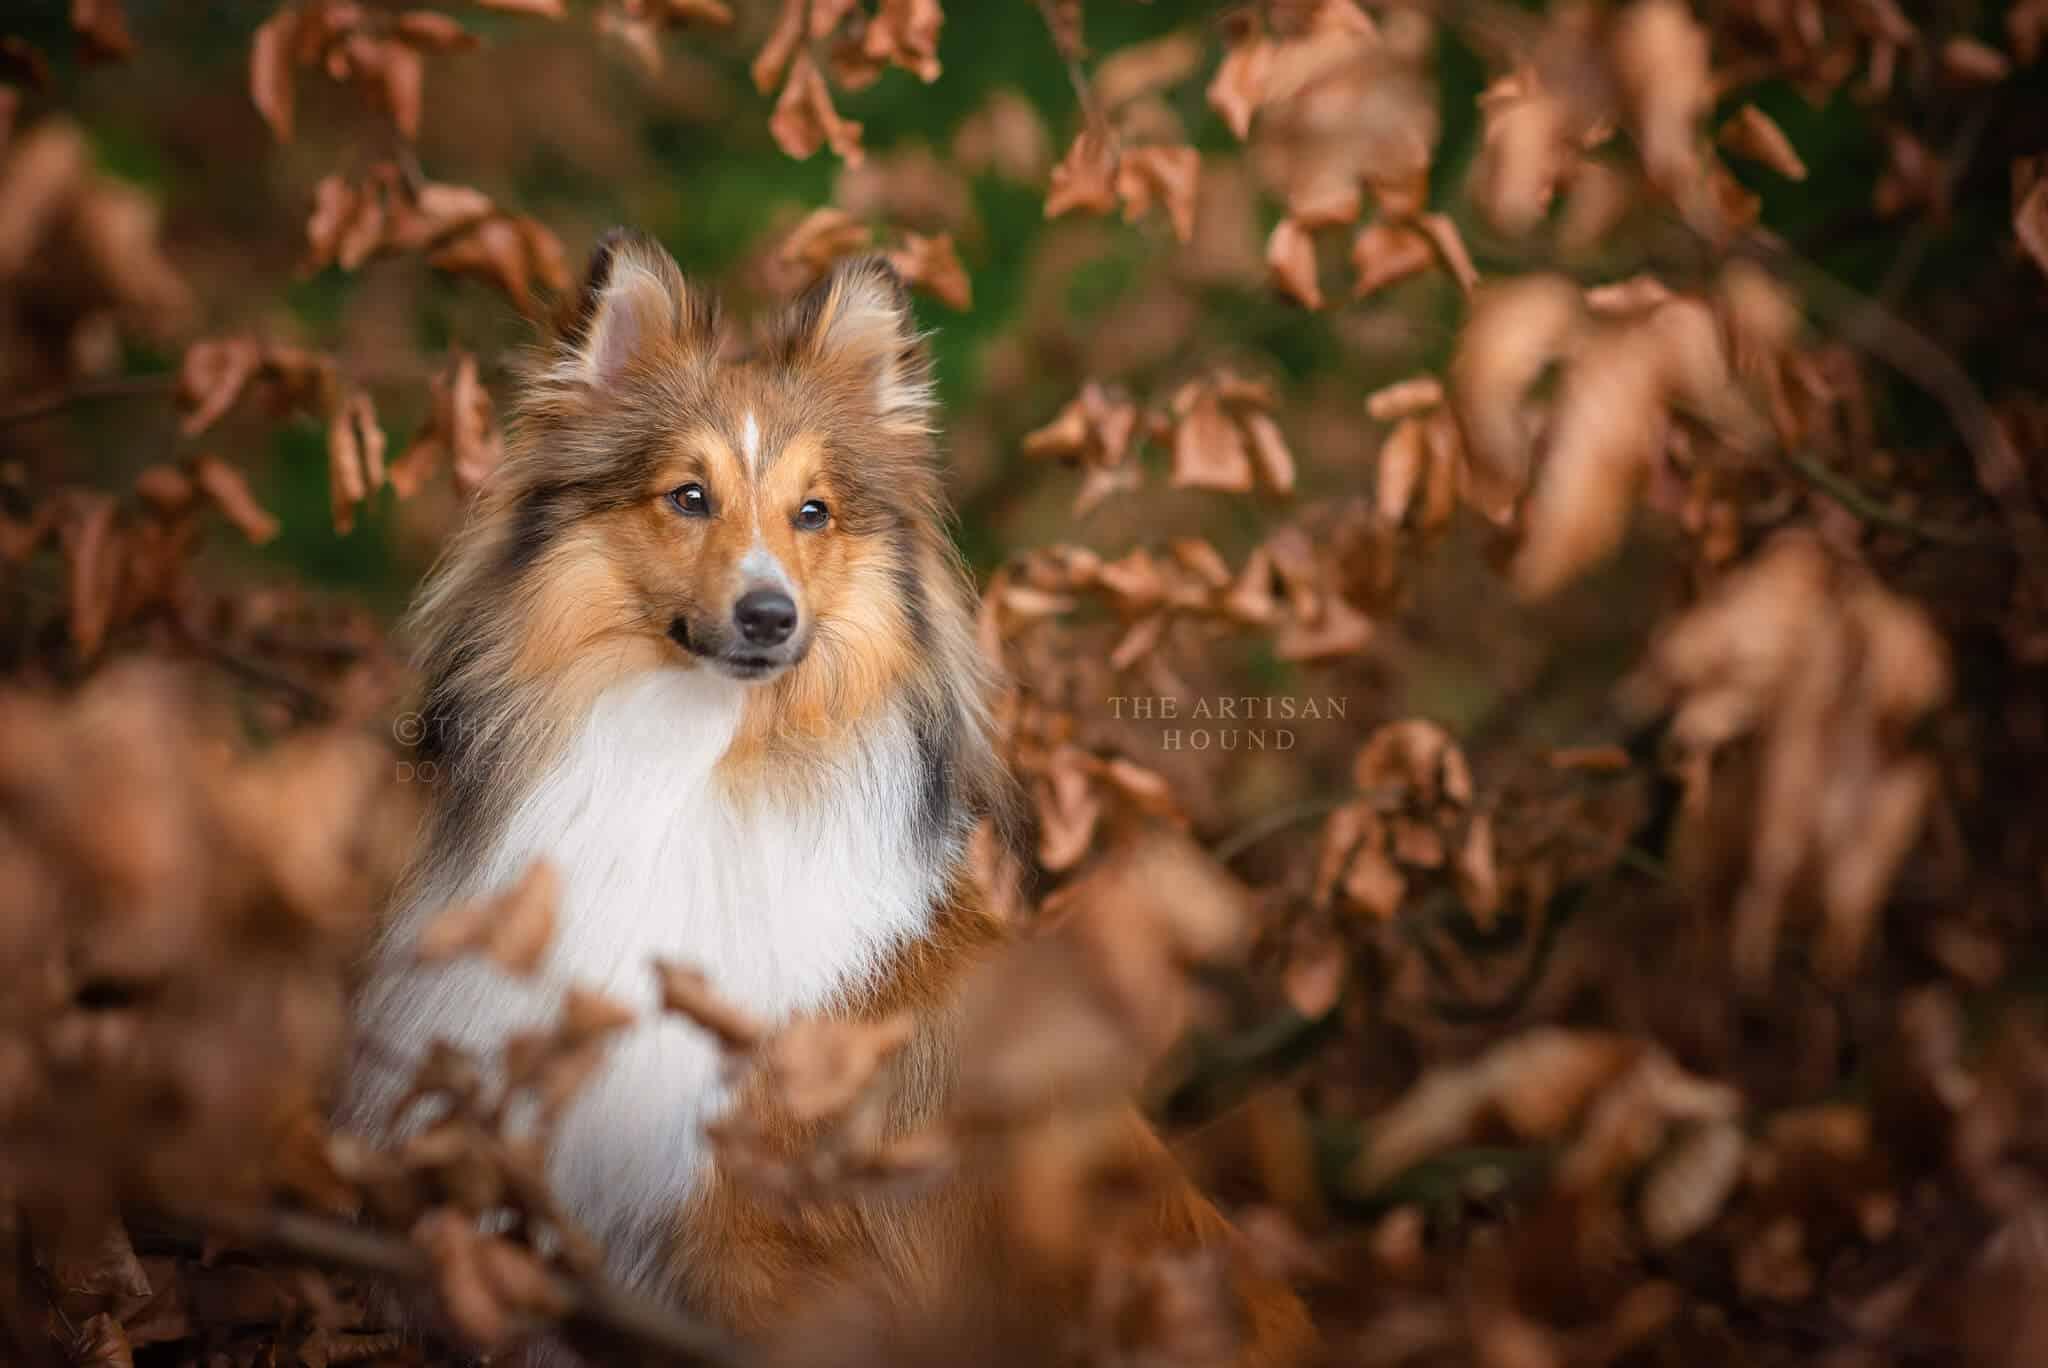 Shetland Sheepdog portrait photography in autumn leaves